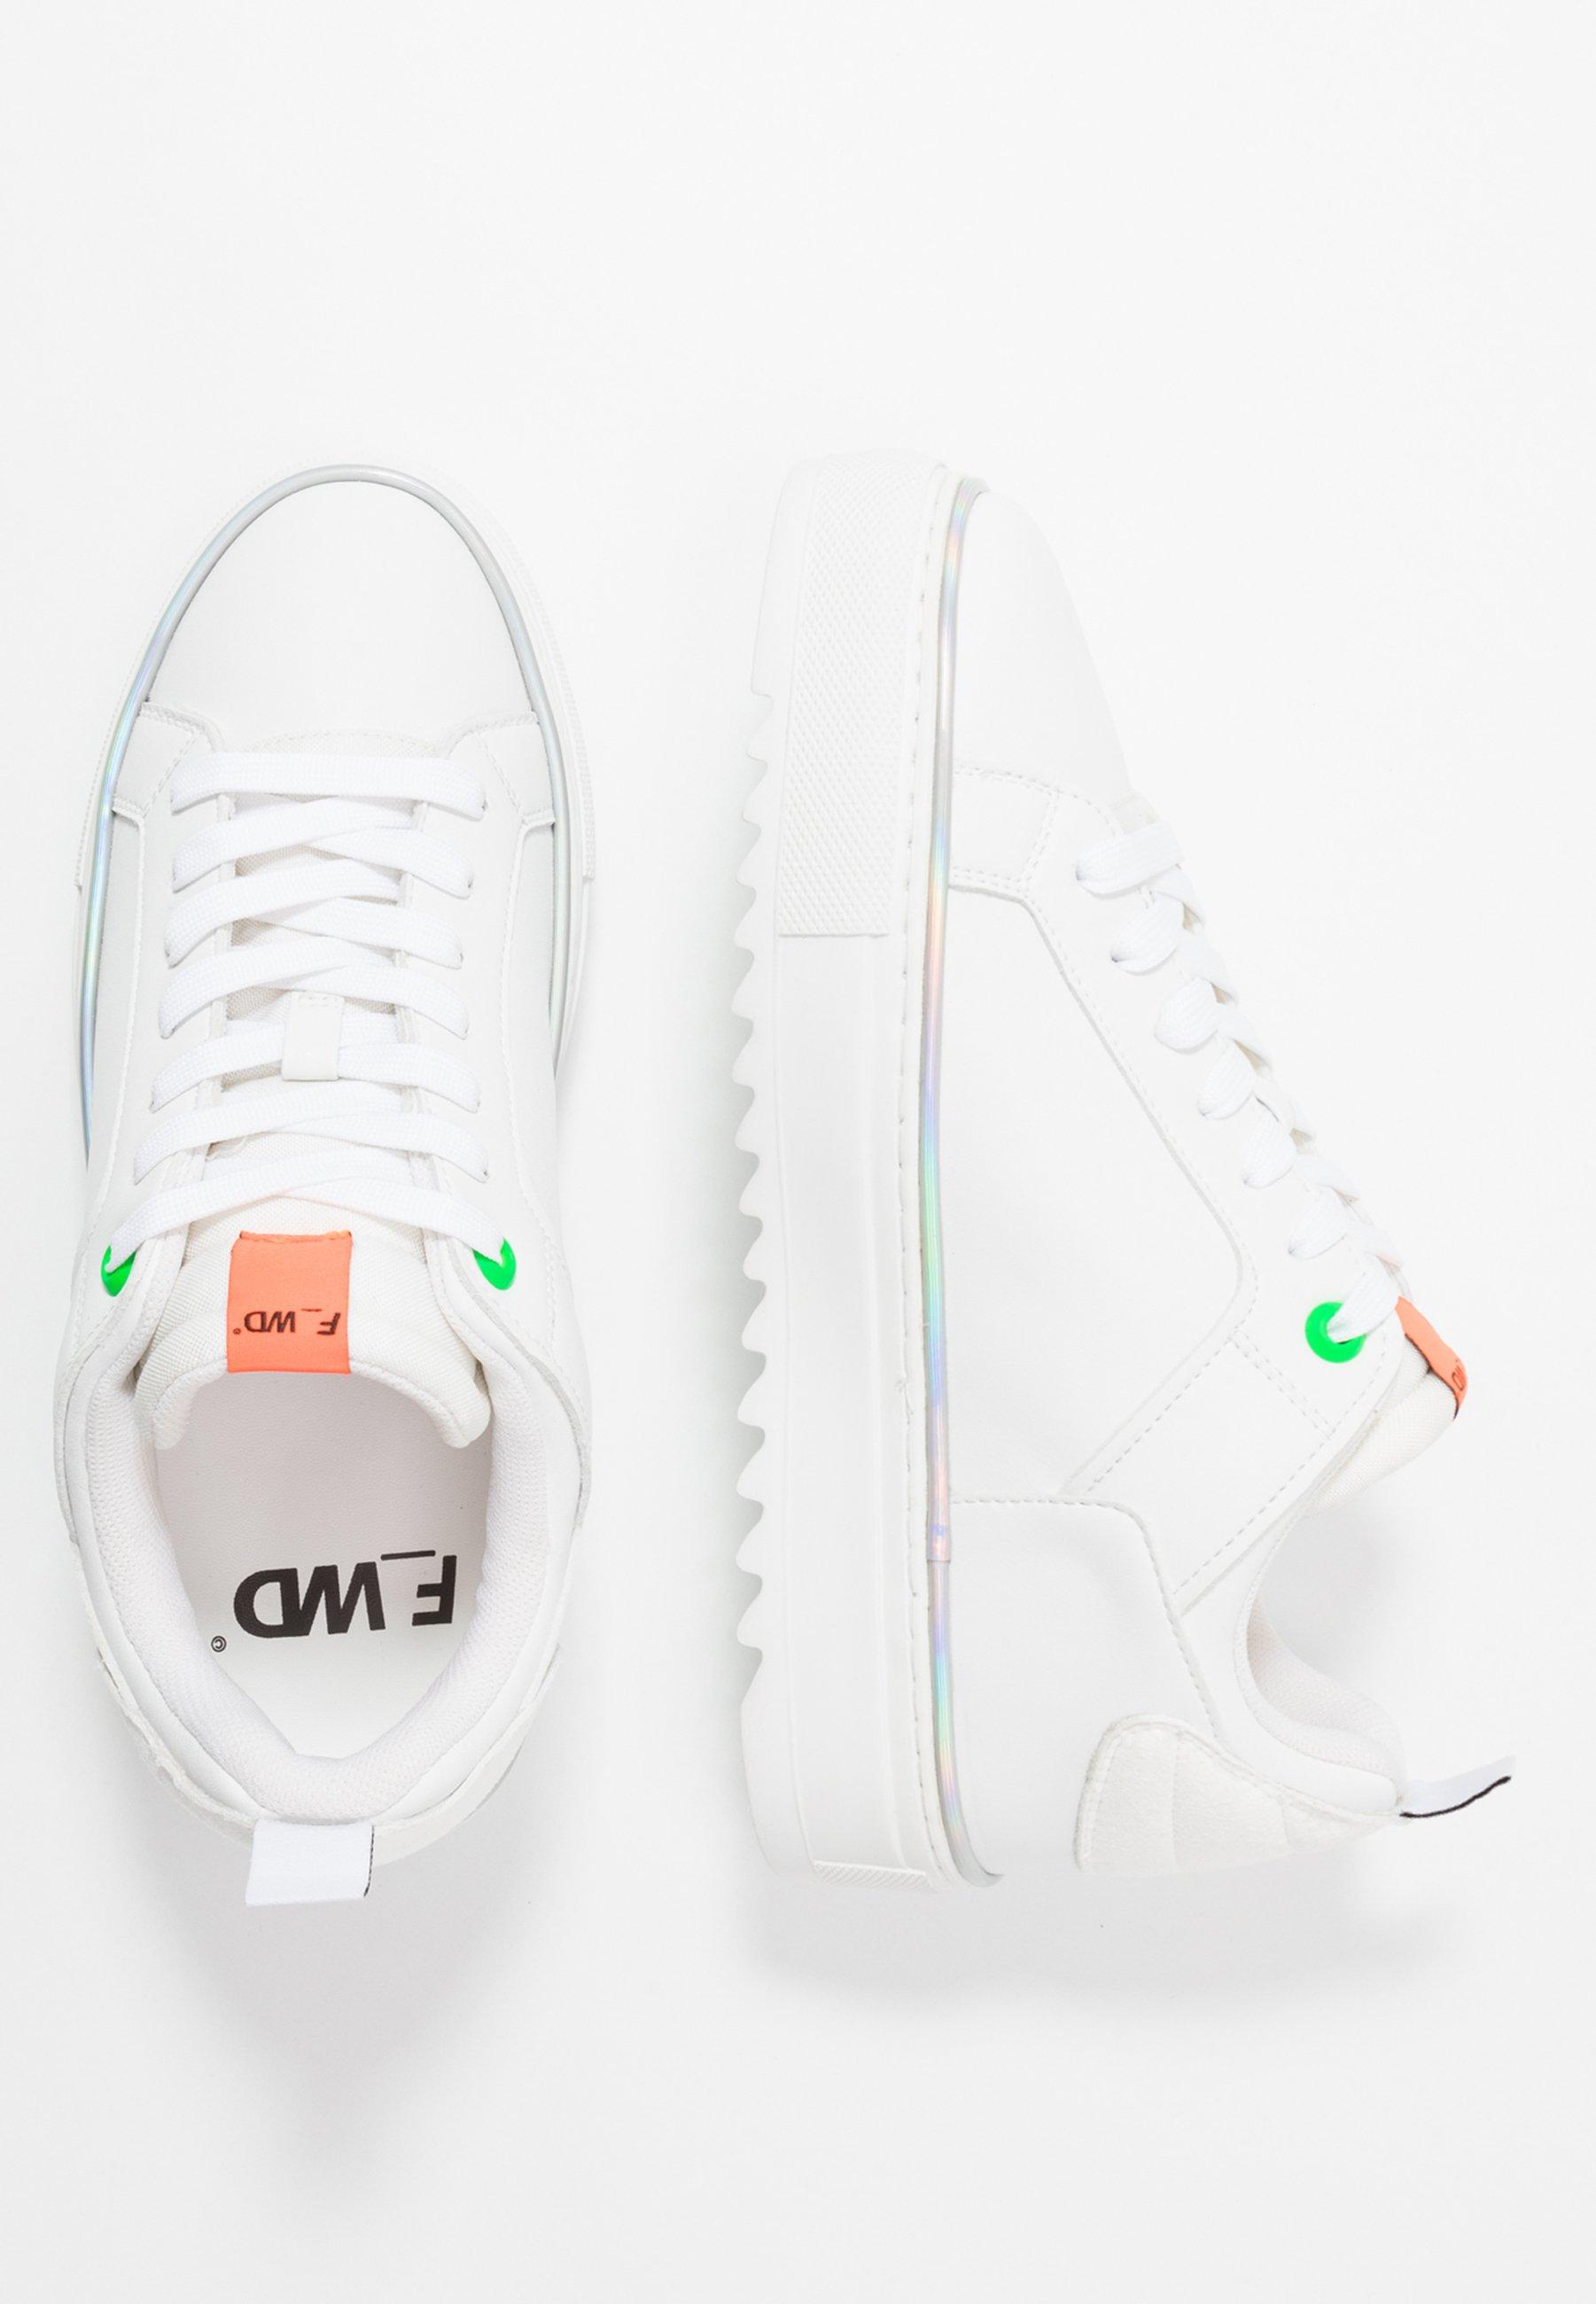 F_wd Sneakers - White/progreen